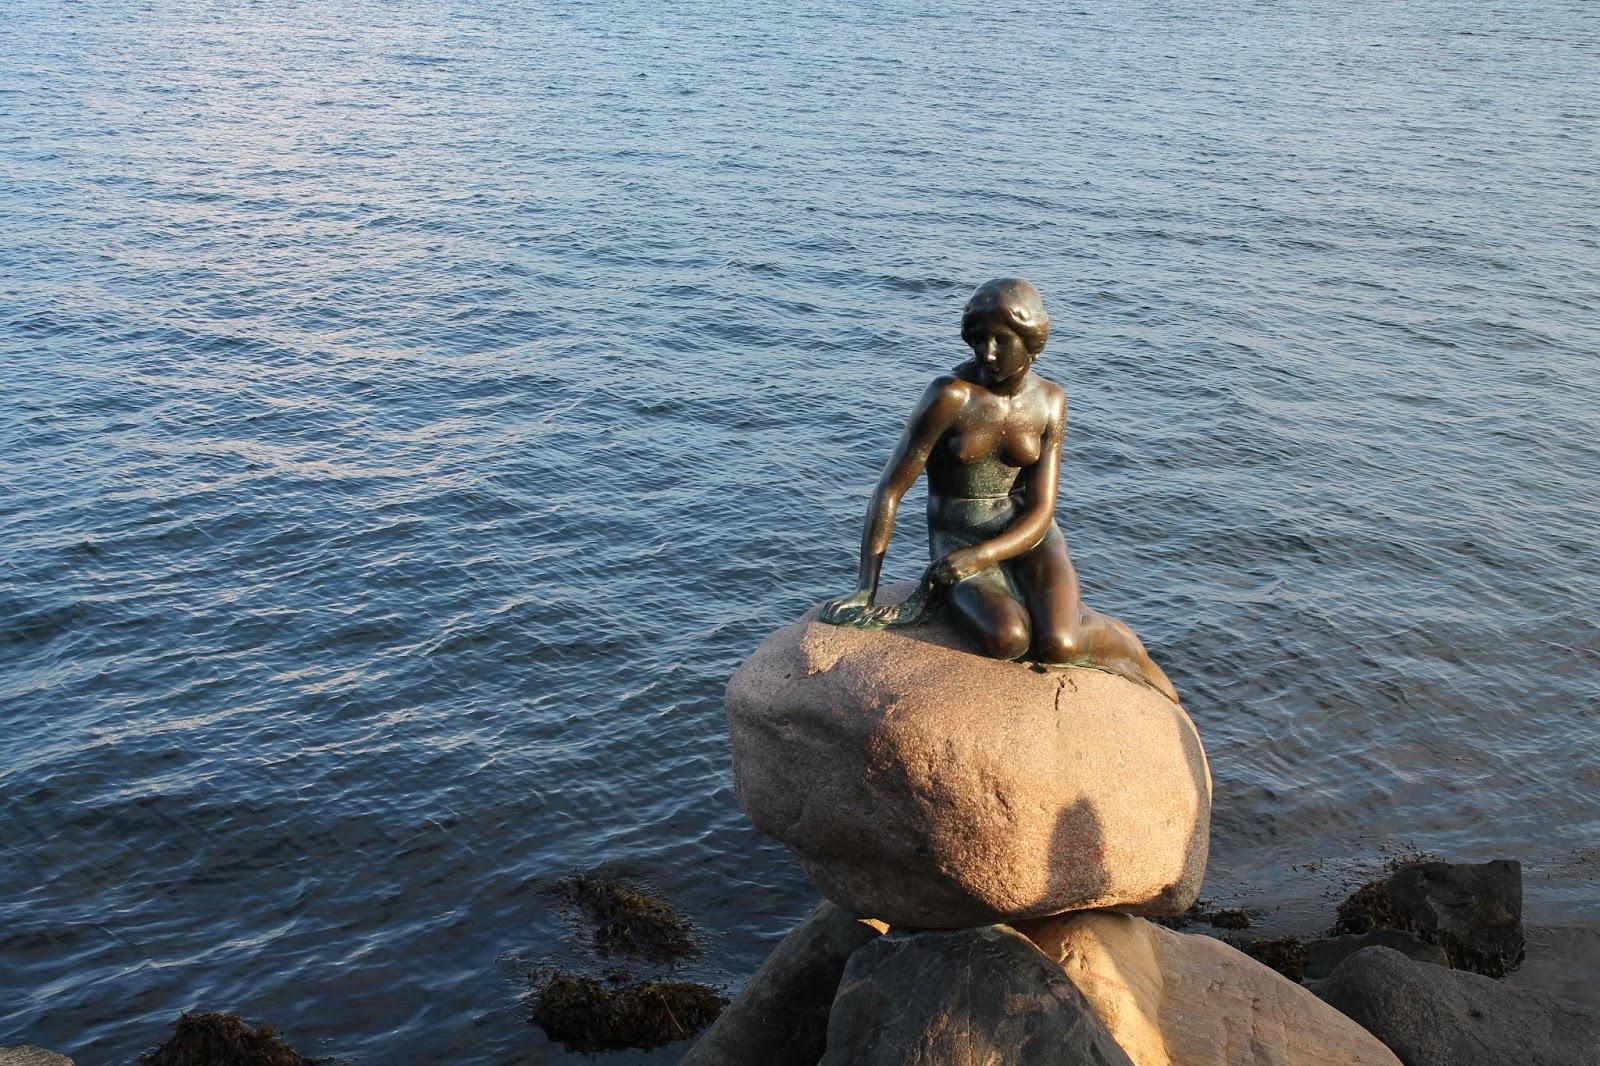 Copenhagen Travel Post - The Little Mermaid